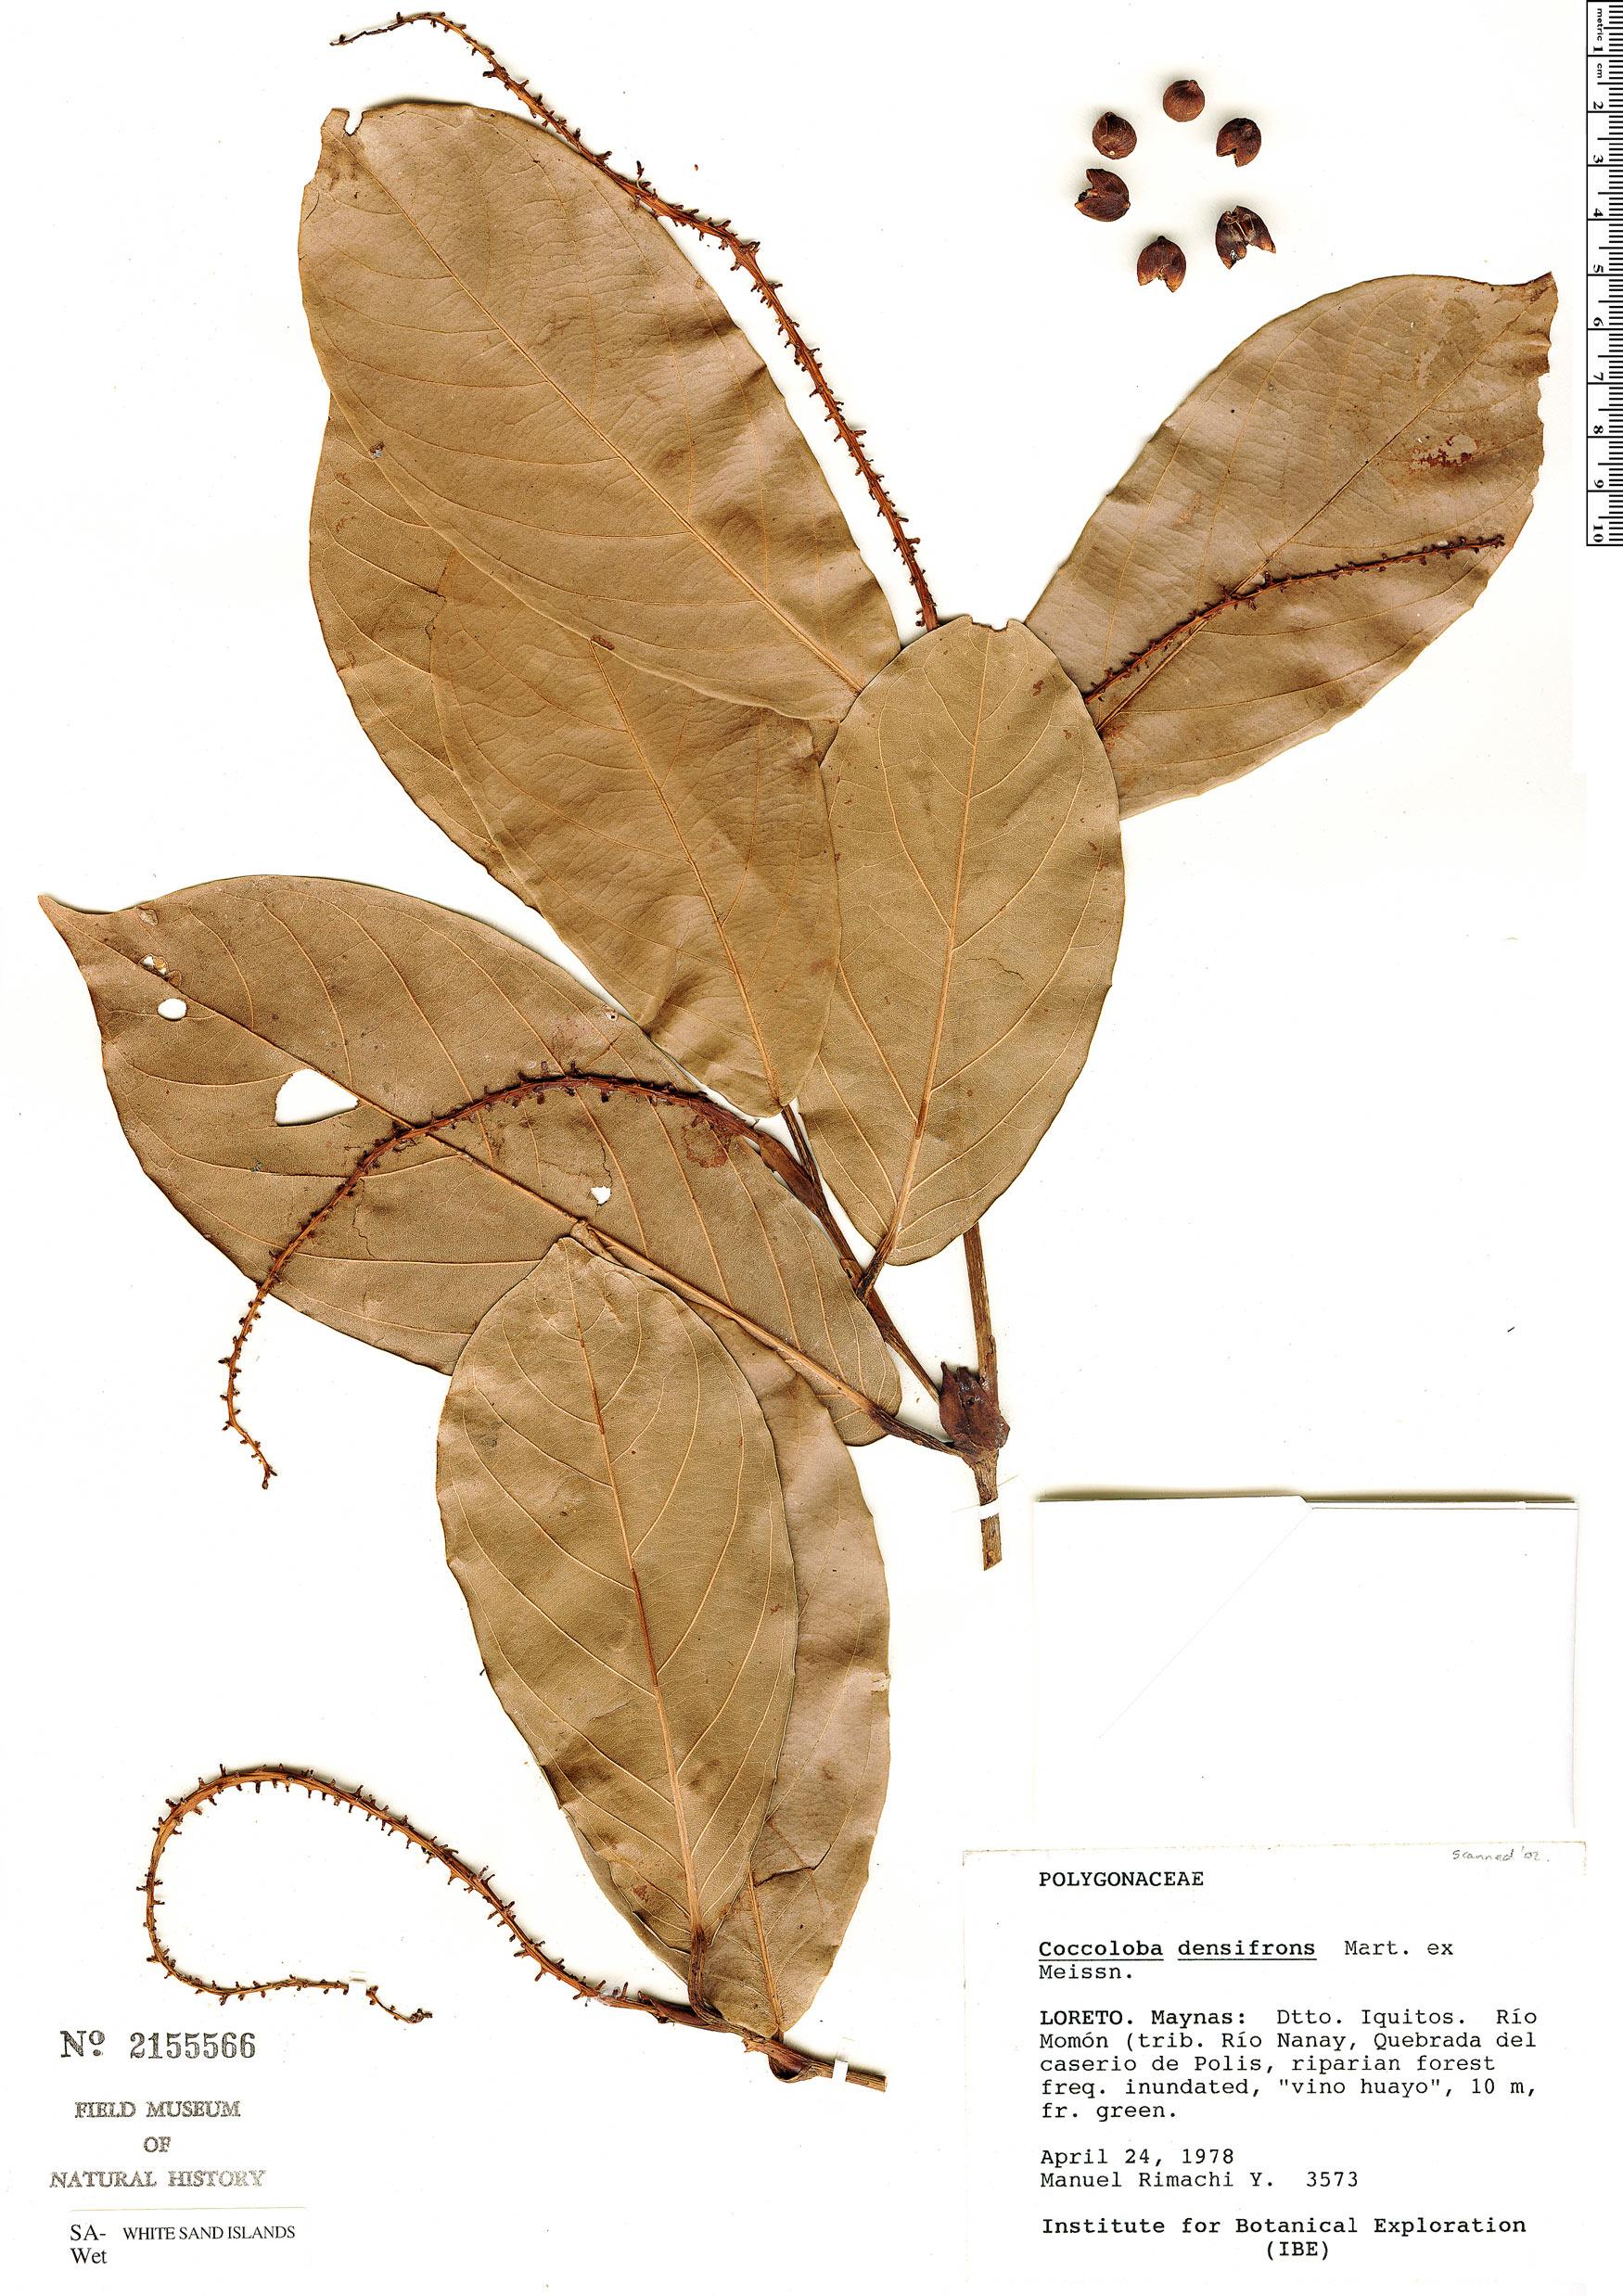 Specimen: Coccoloba densifrons